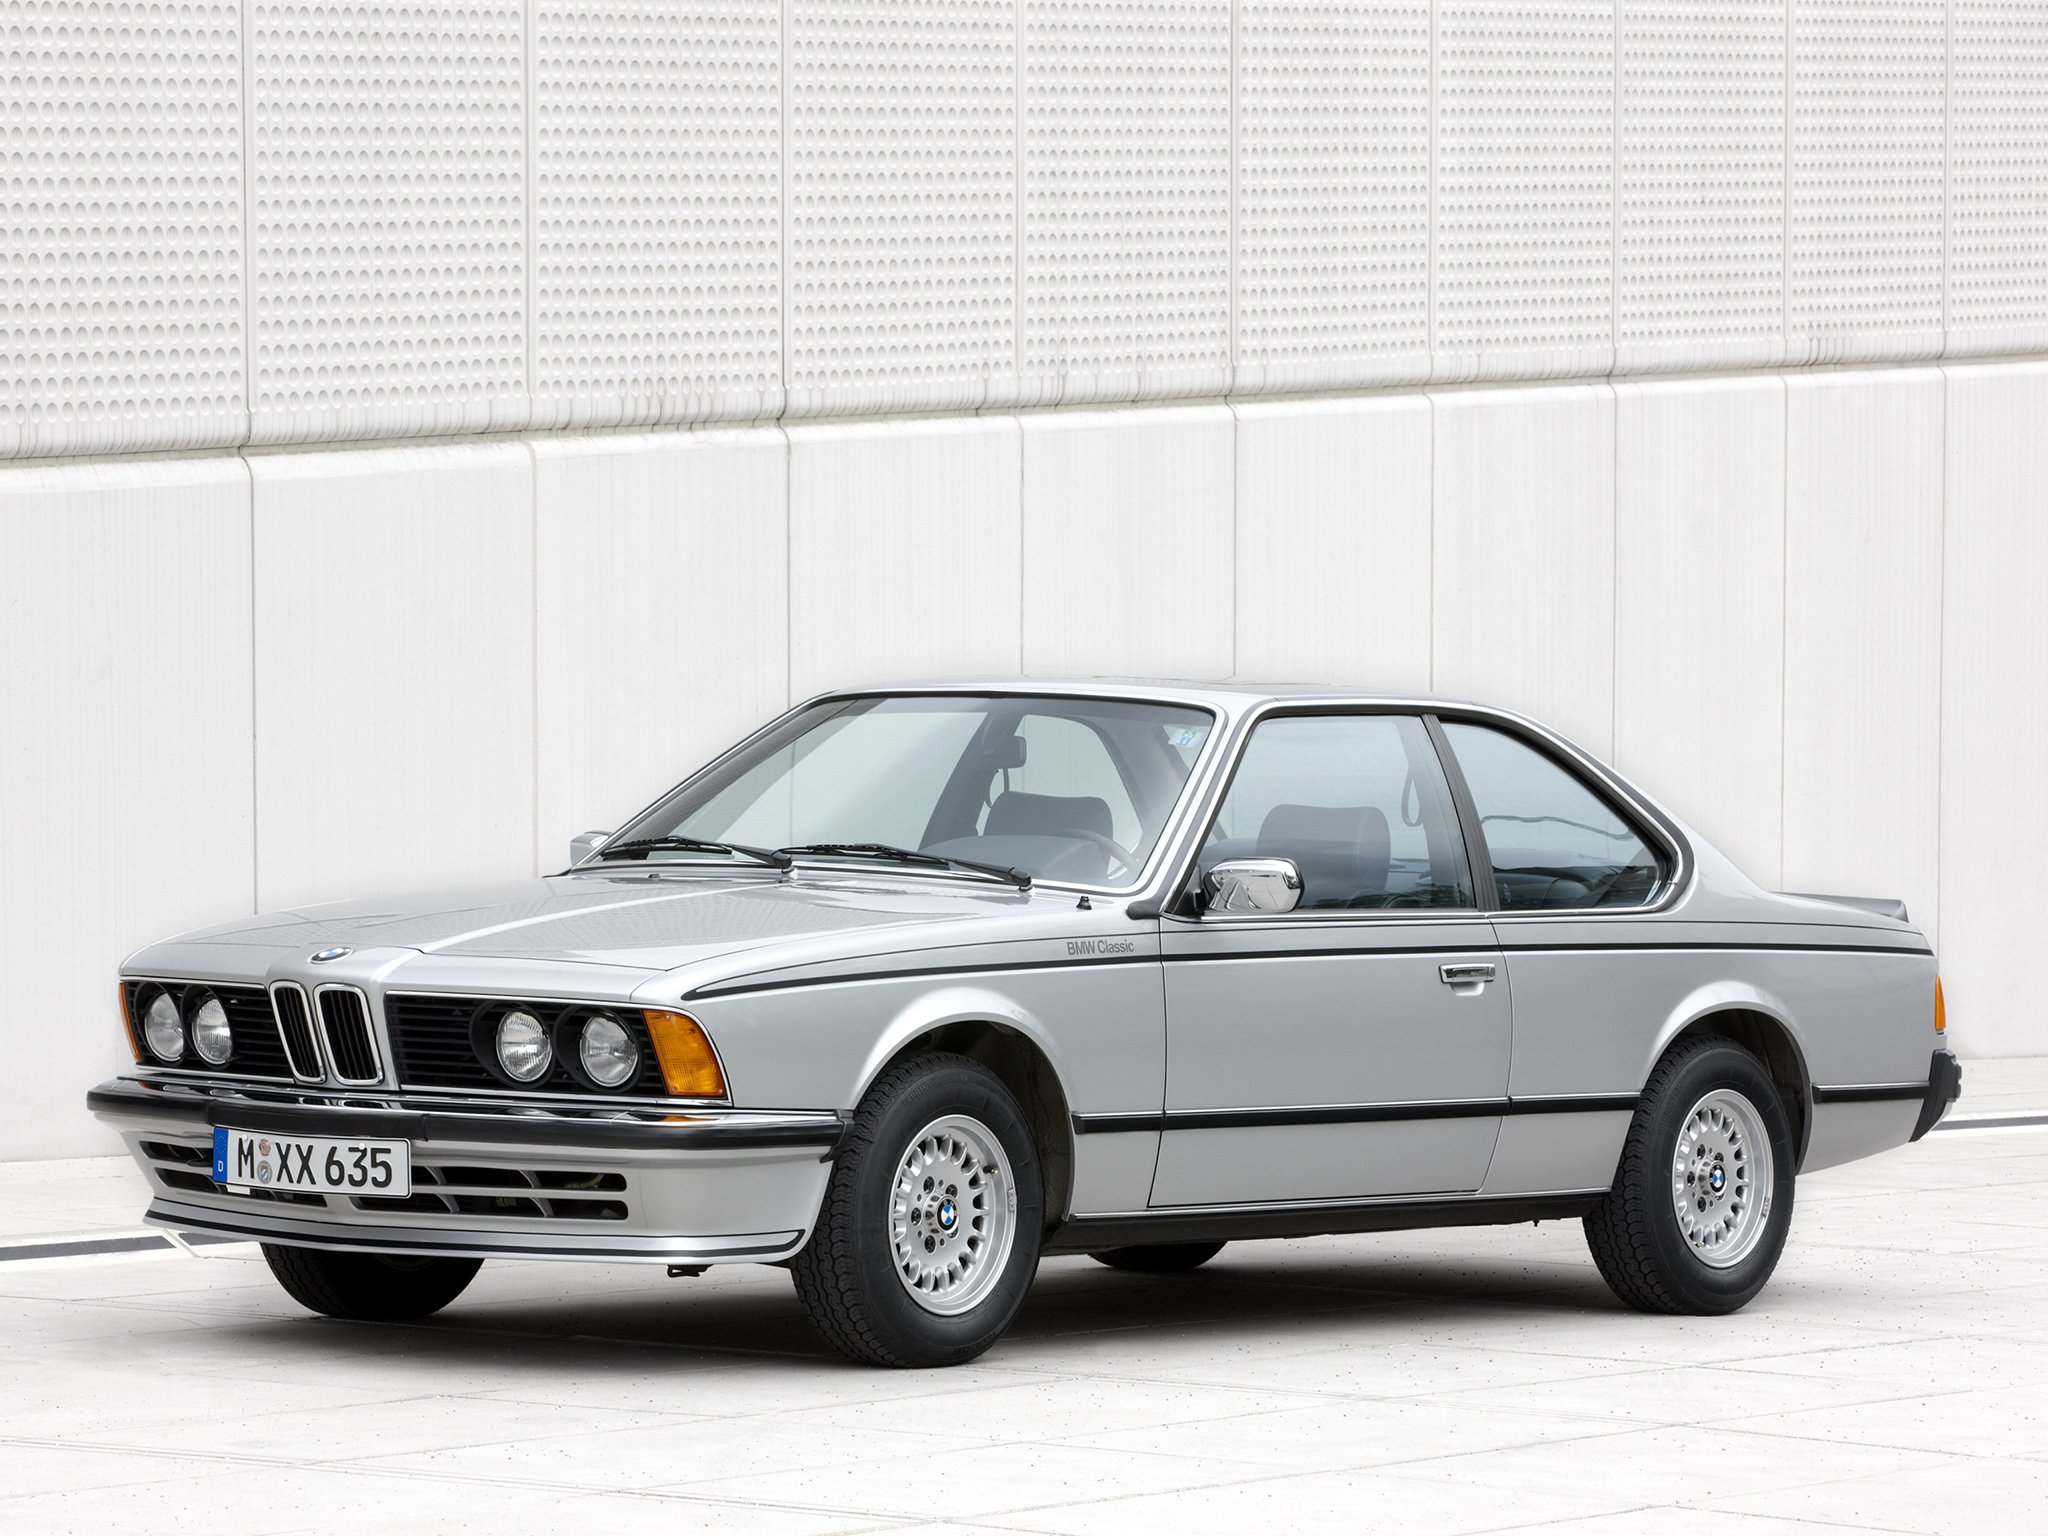 Bmw M6 1983de E24 635 Csi The Observer Coupe Autoblog Nl Wiring Diagrams Cars 1978 Wallpaper 2048x1536